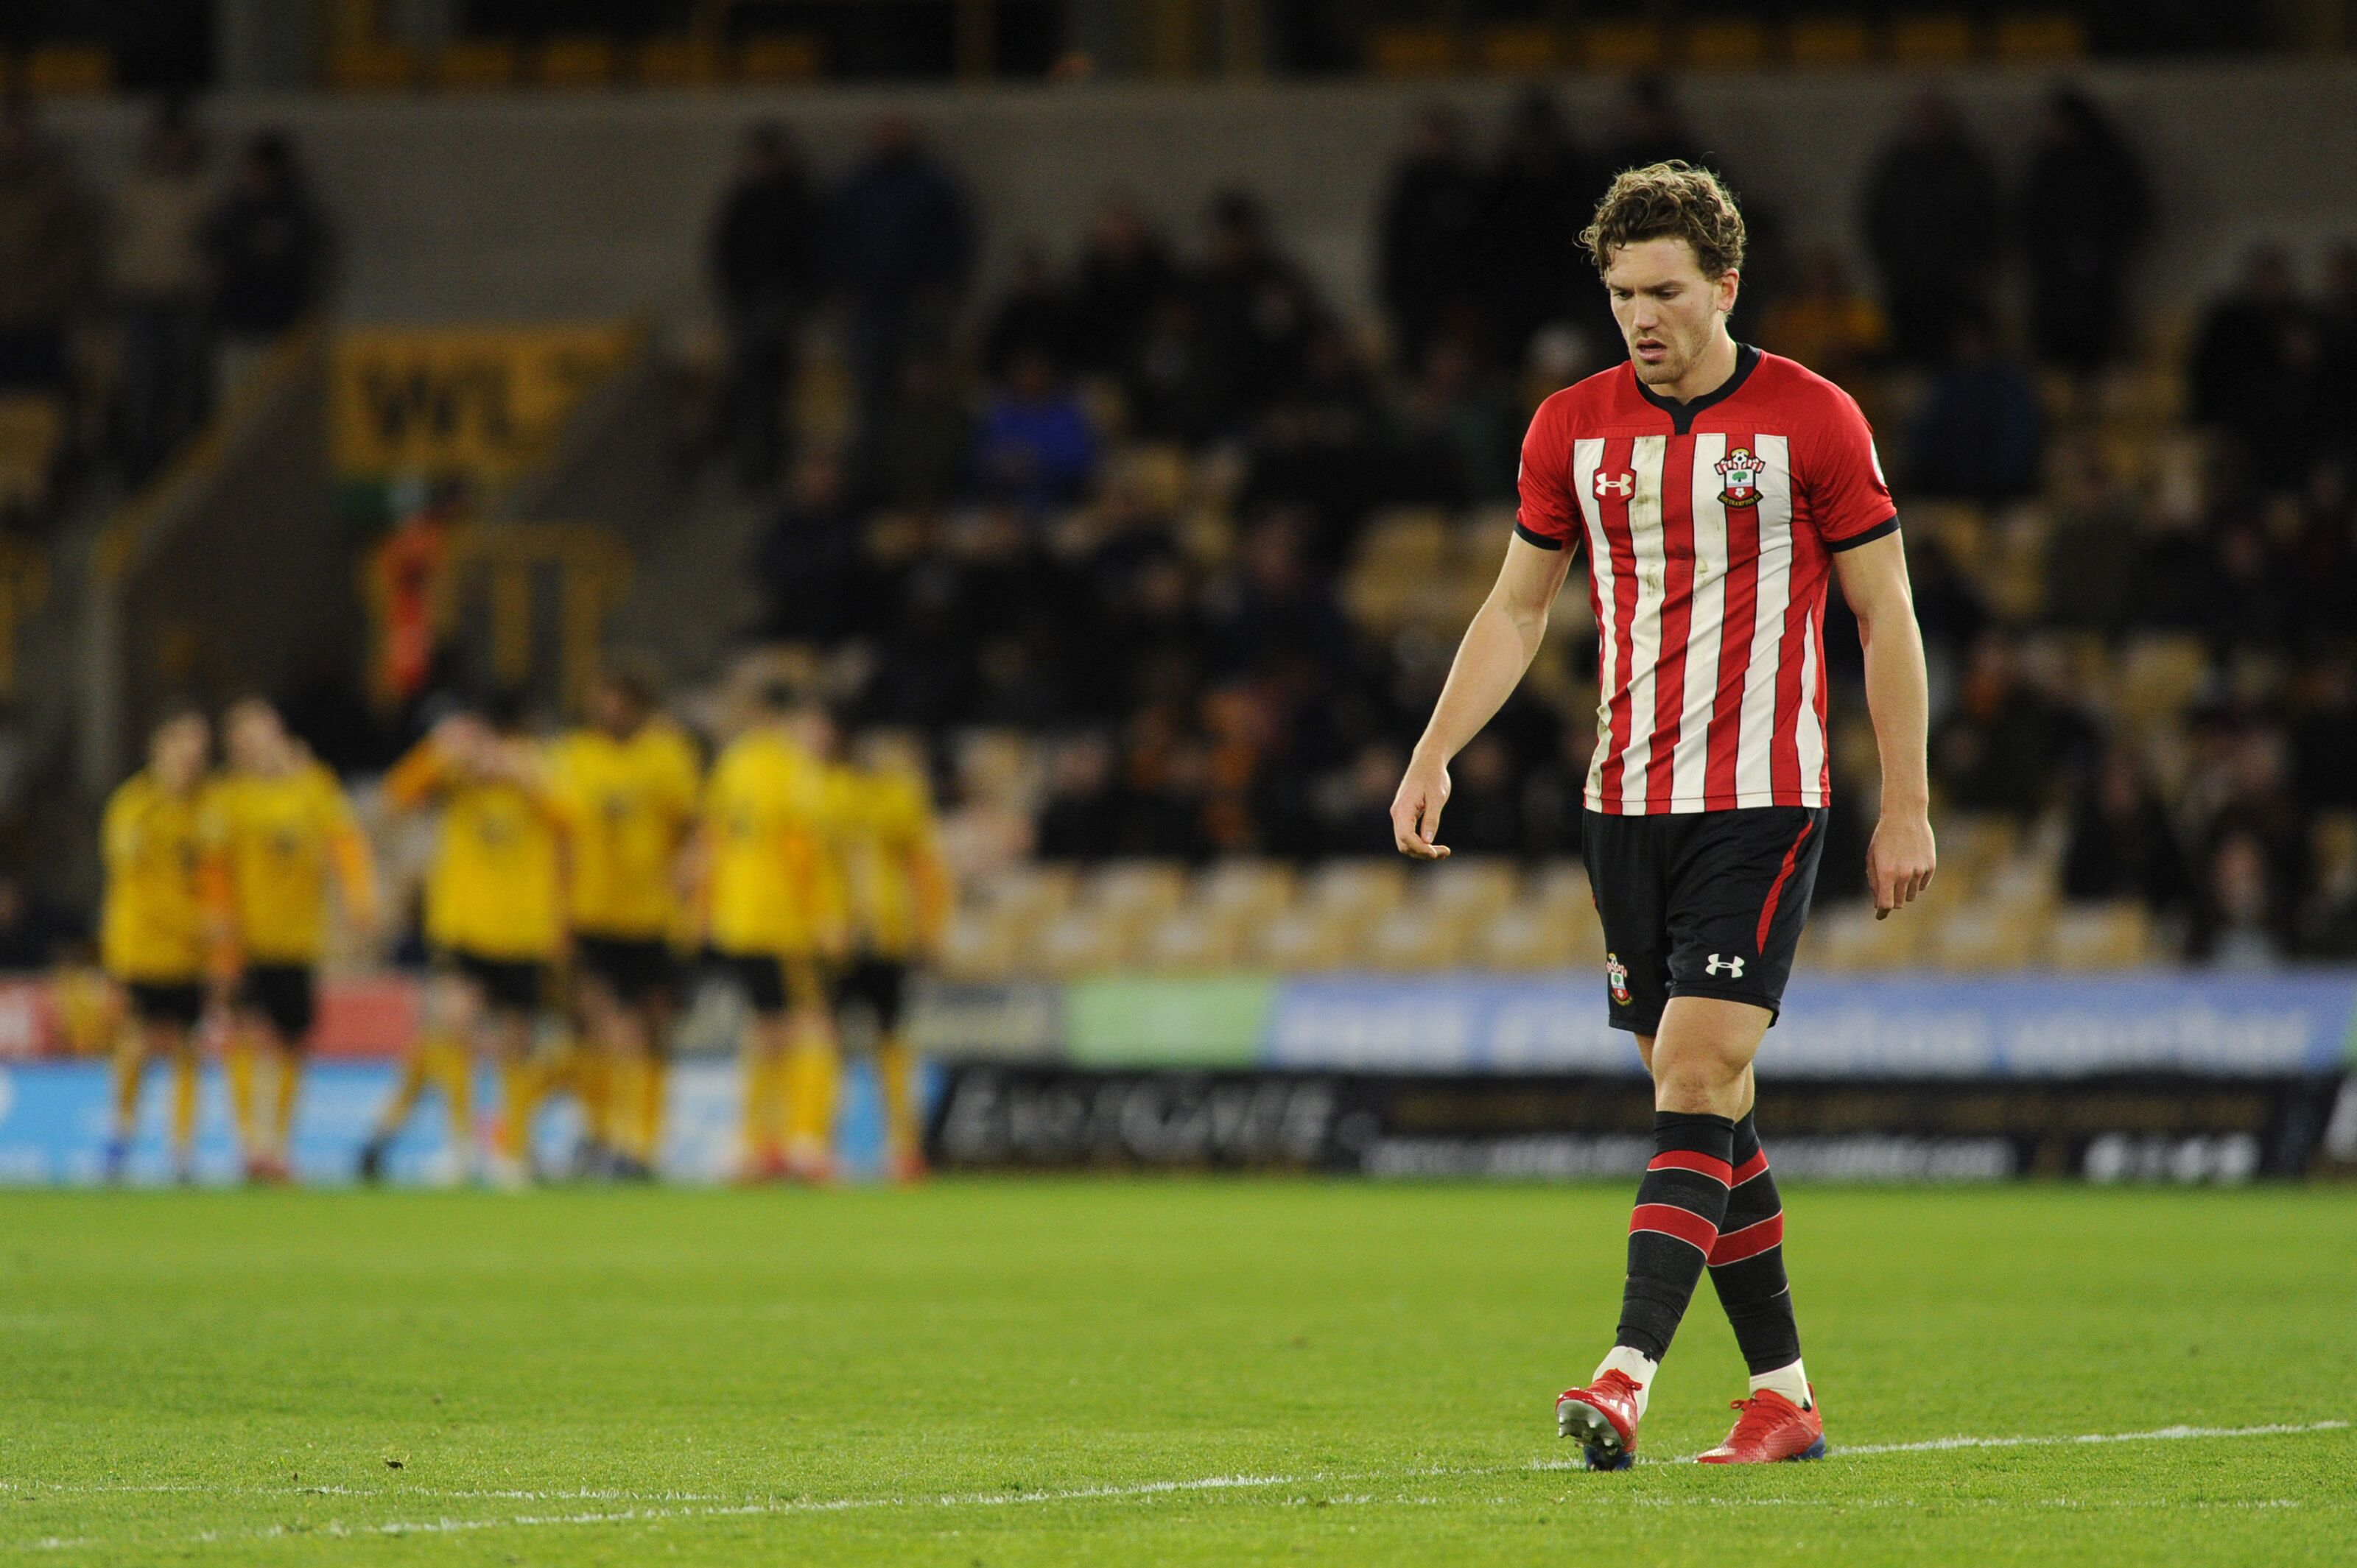 Southampton: Saints striker set for £5m transfer to Blackburn Rovers